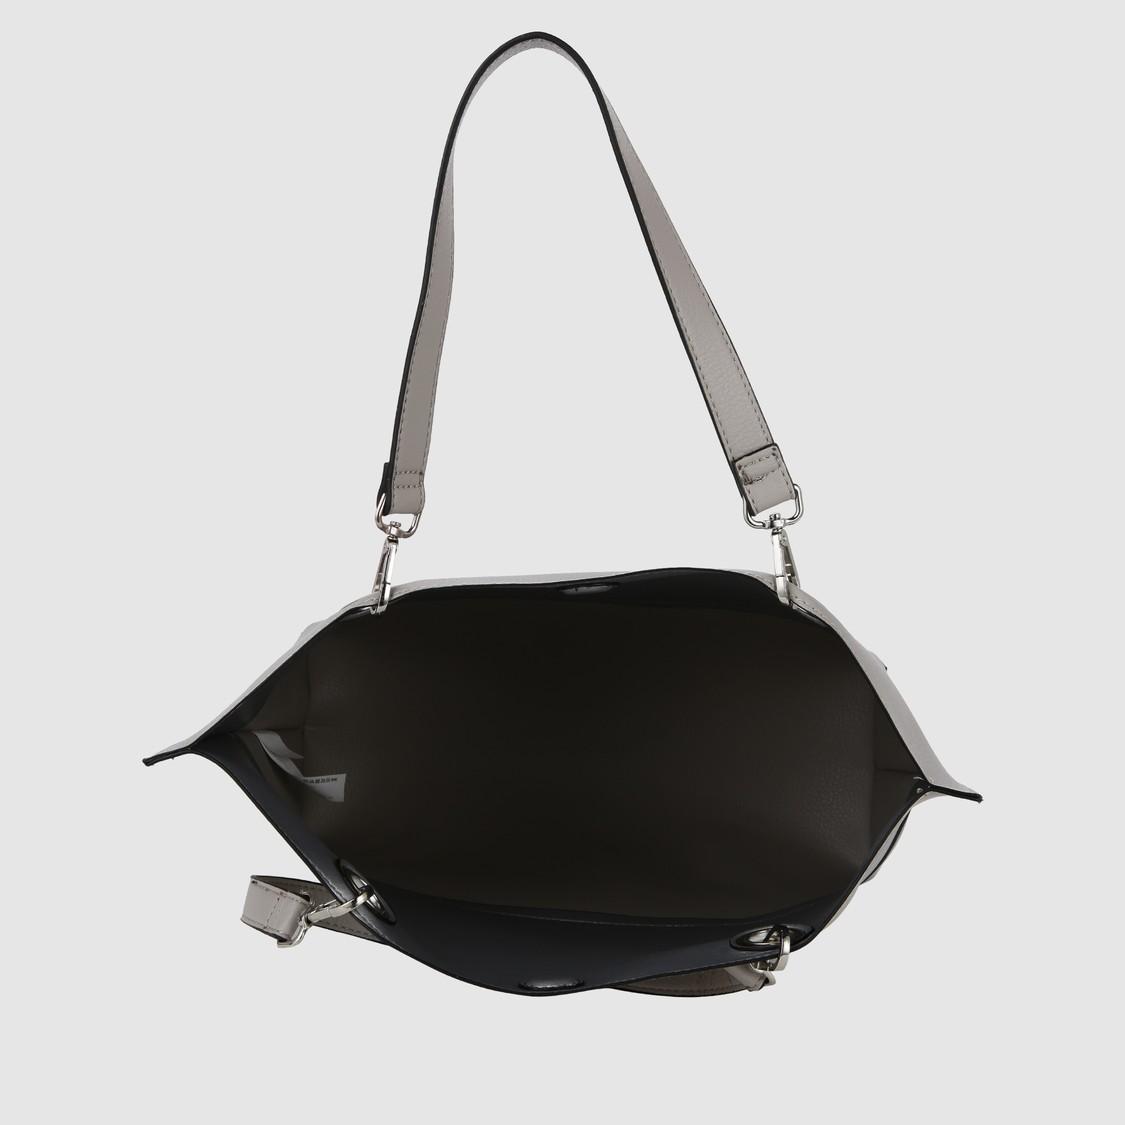 Textured Tote Handbag